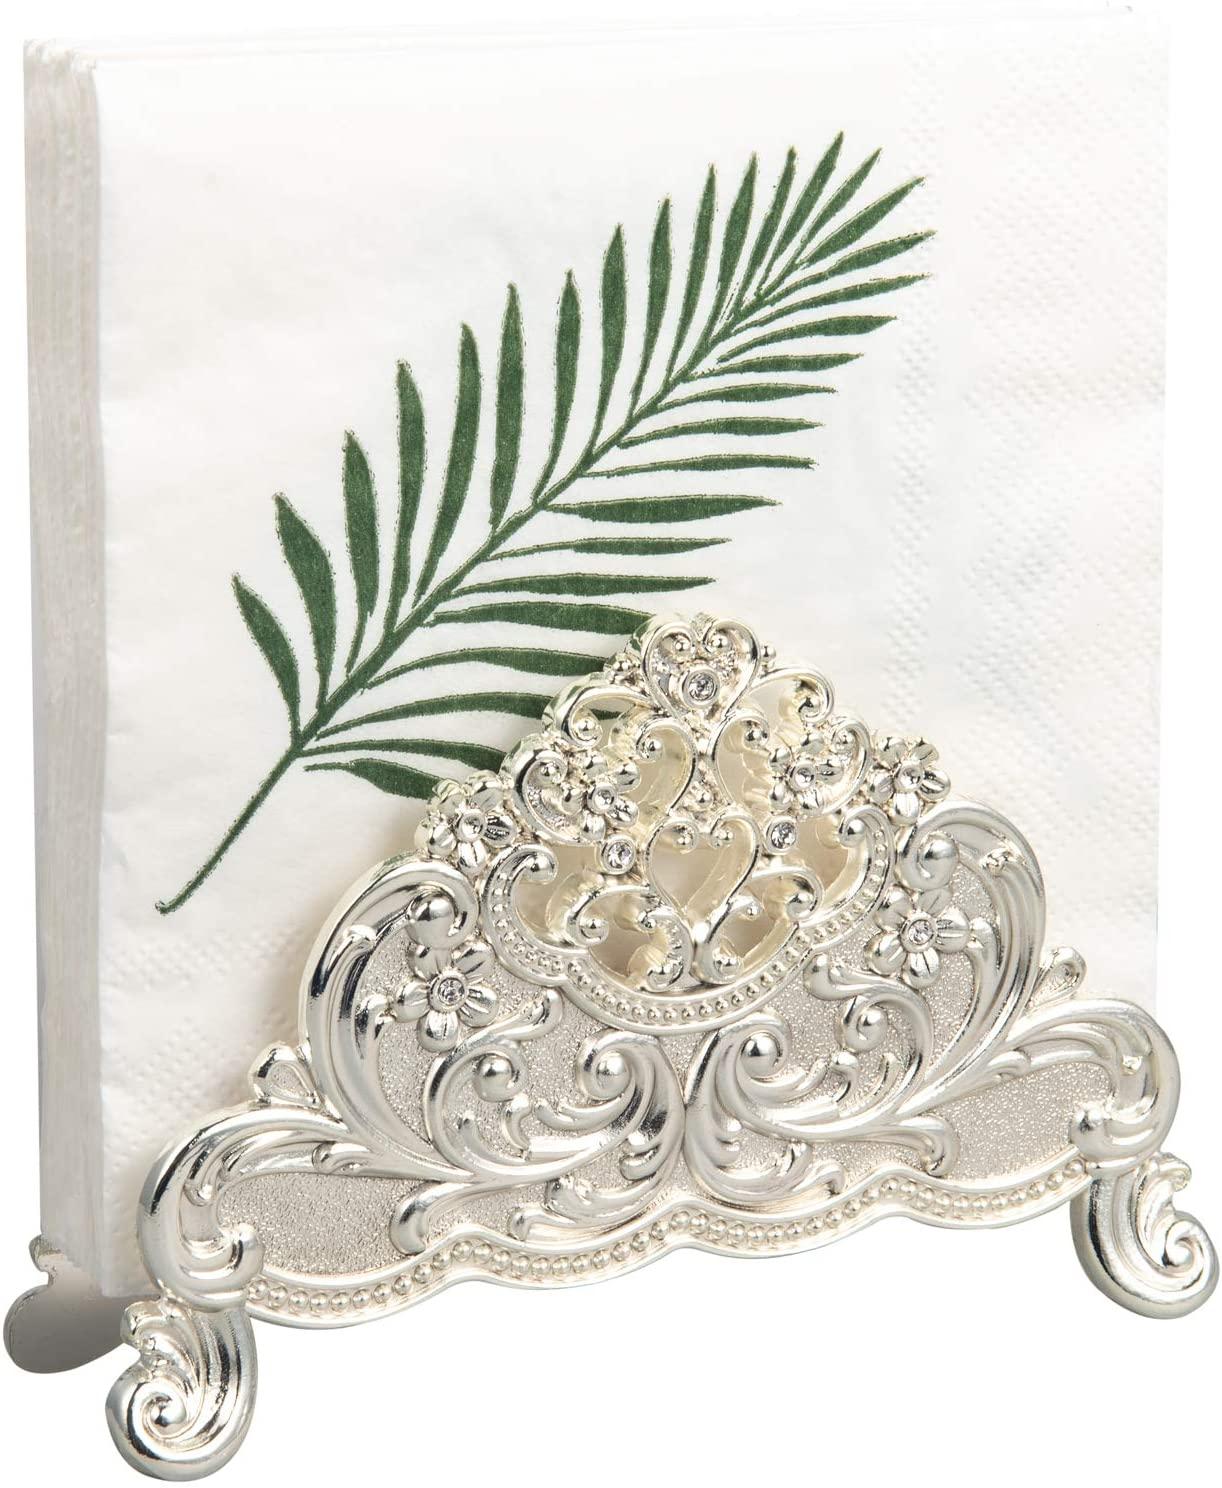 Feyarl Napkin Paper Tissues Holder Table Top Vintage Decorative Napkin Holder Stand (Silver)